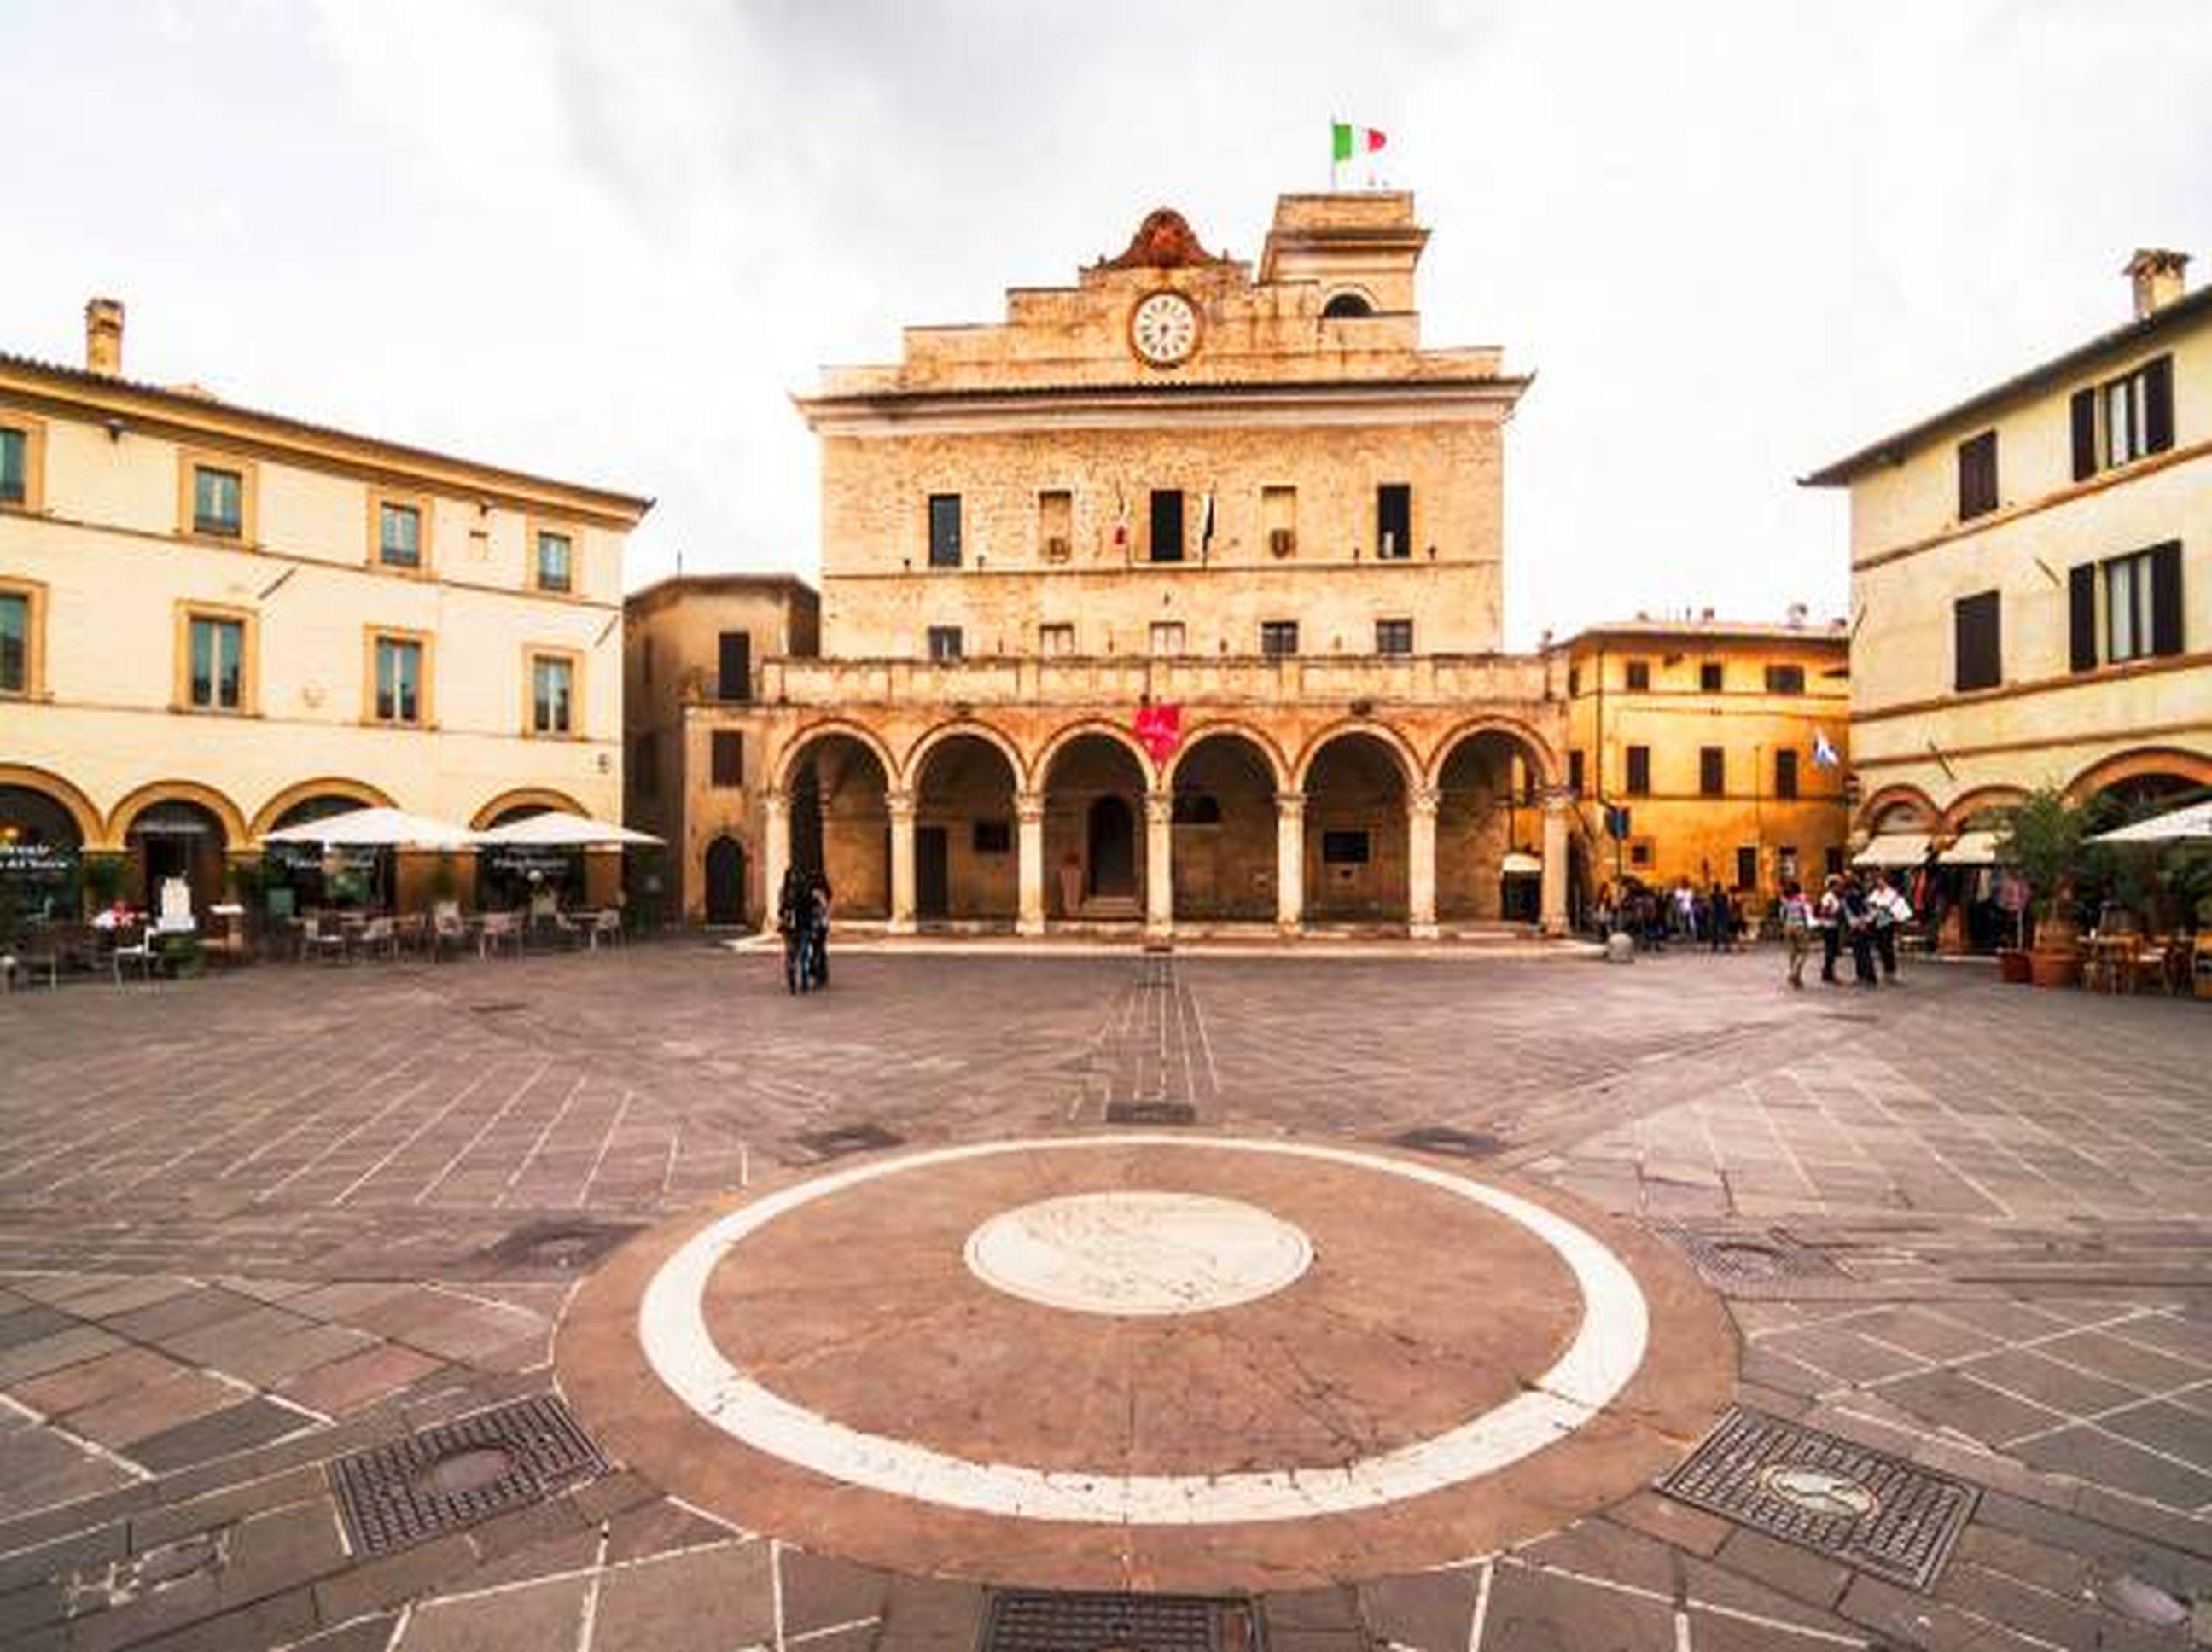 Montefalco Square